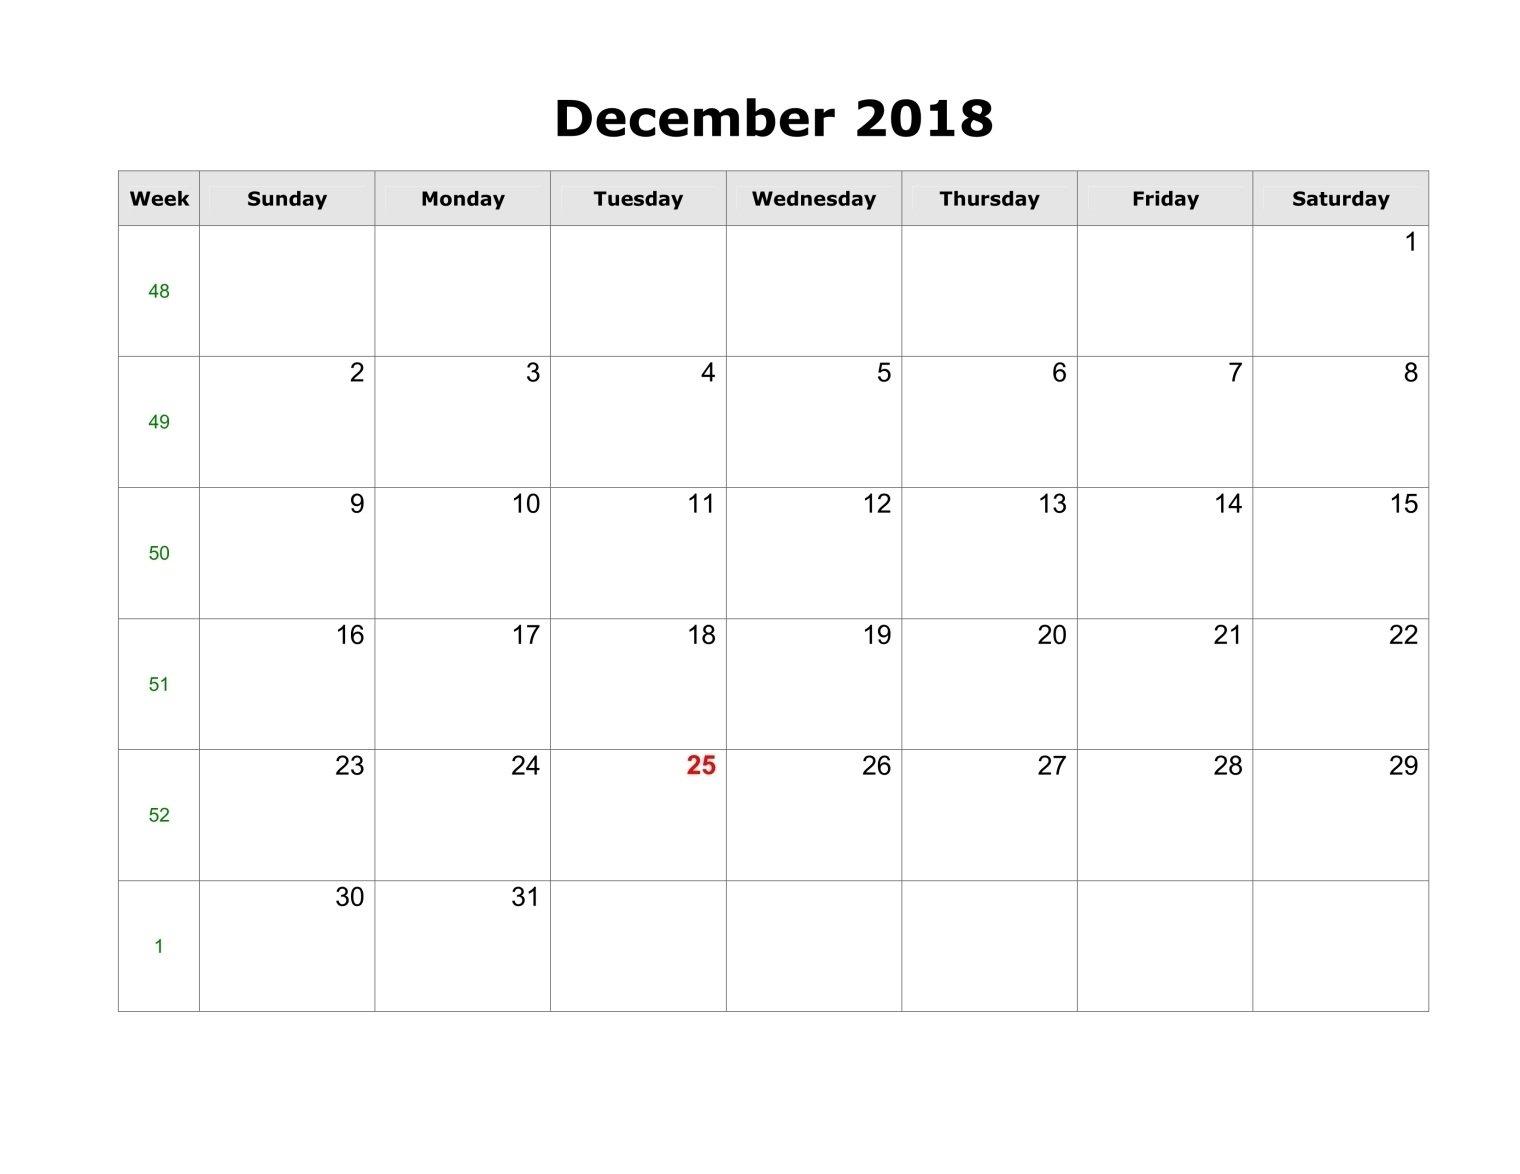 December 2018 Calendar Template Pdf, Word, Excel – Printable Calendar 2019 Template Pdf